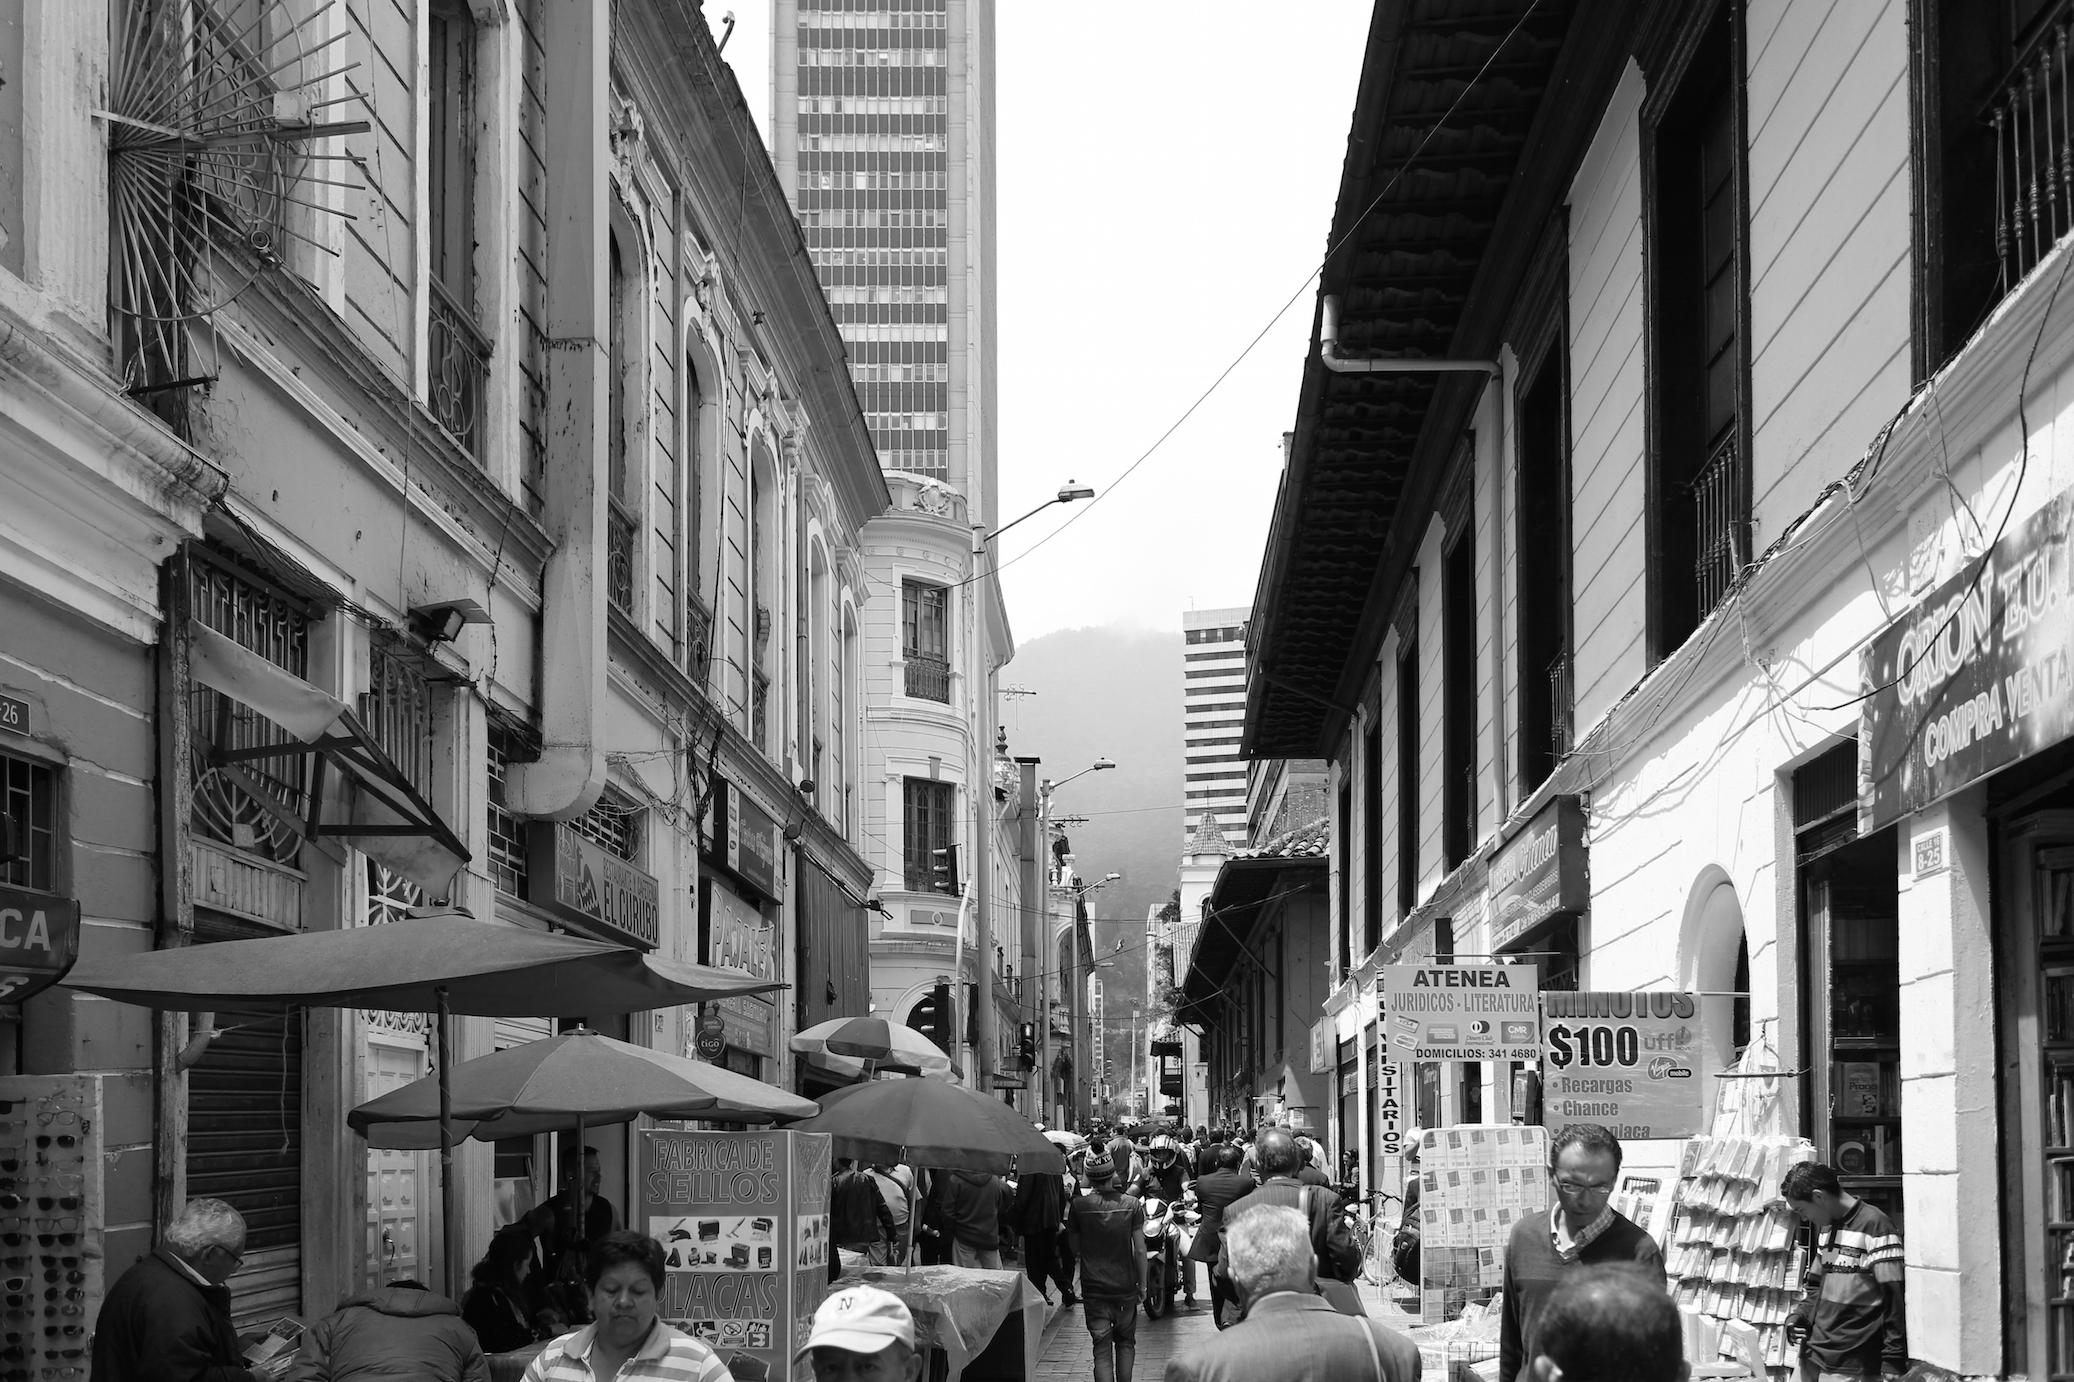 Calle torcida